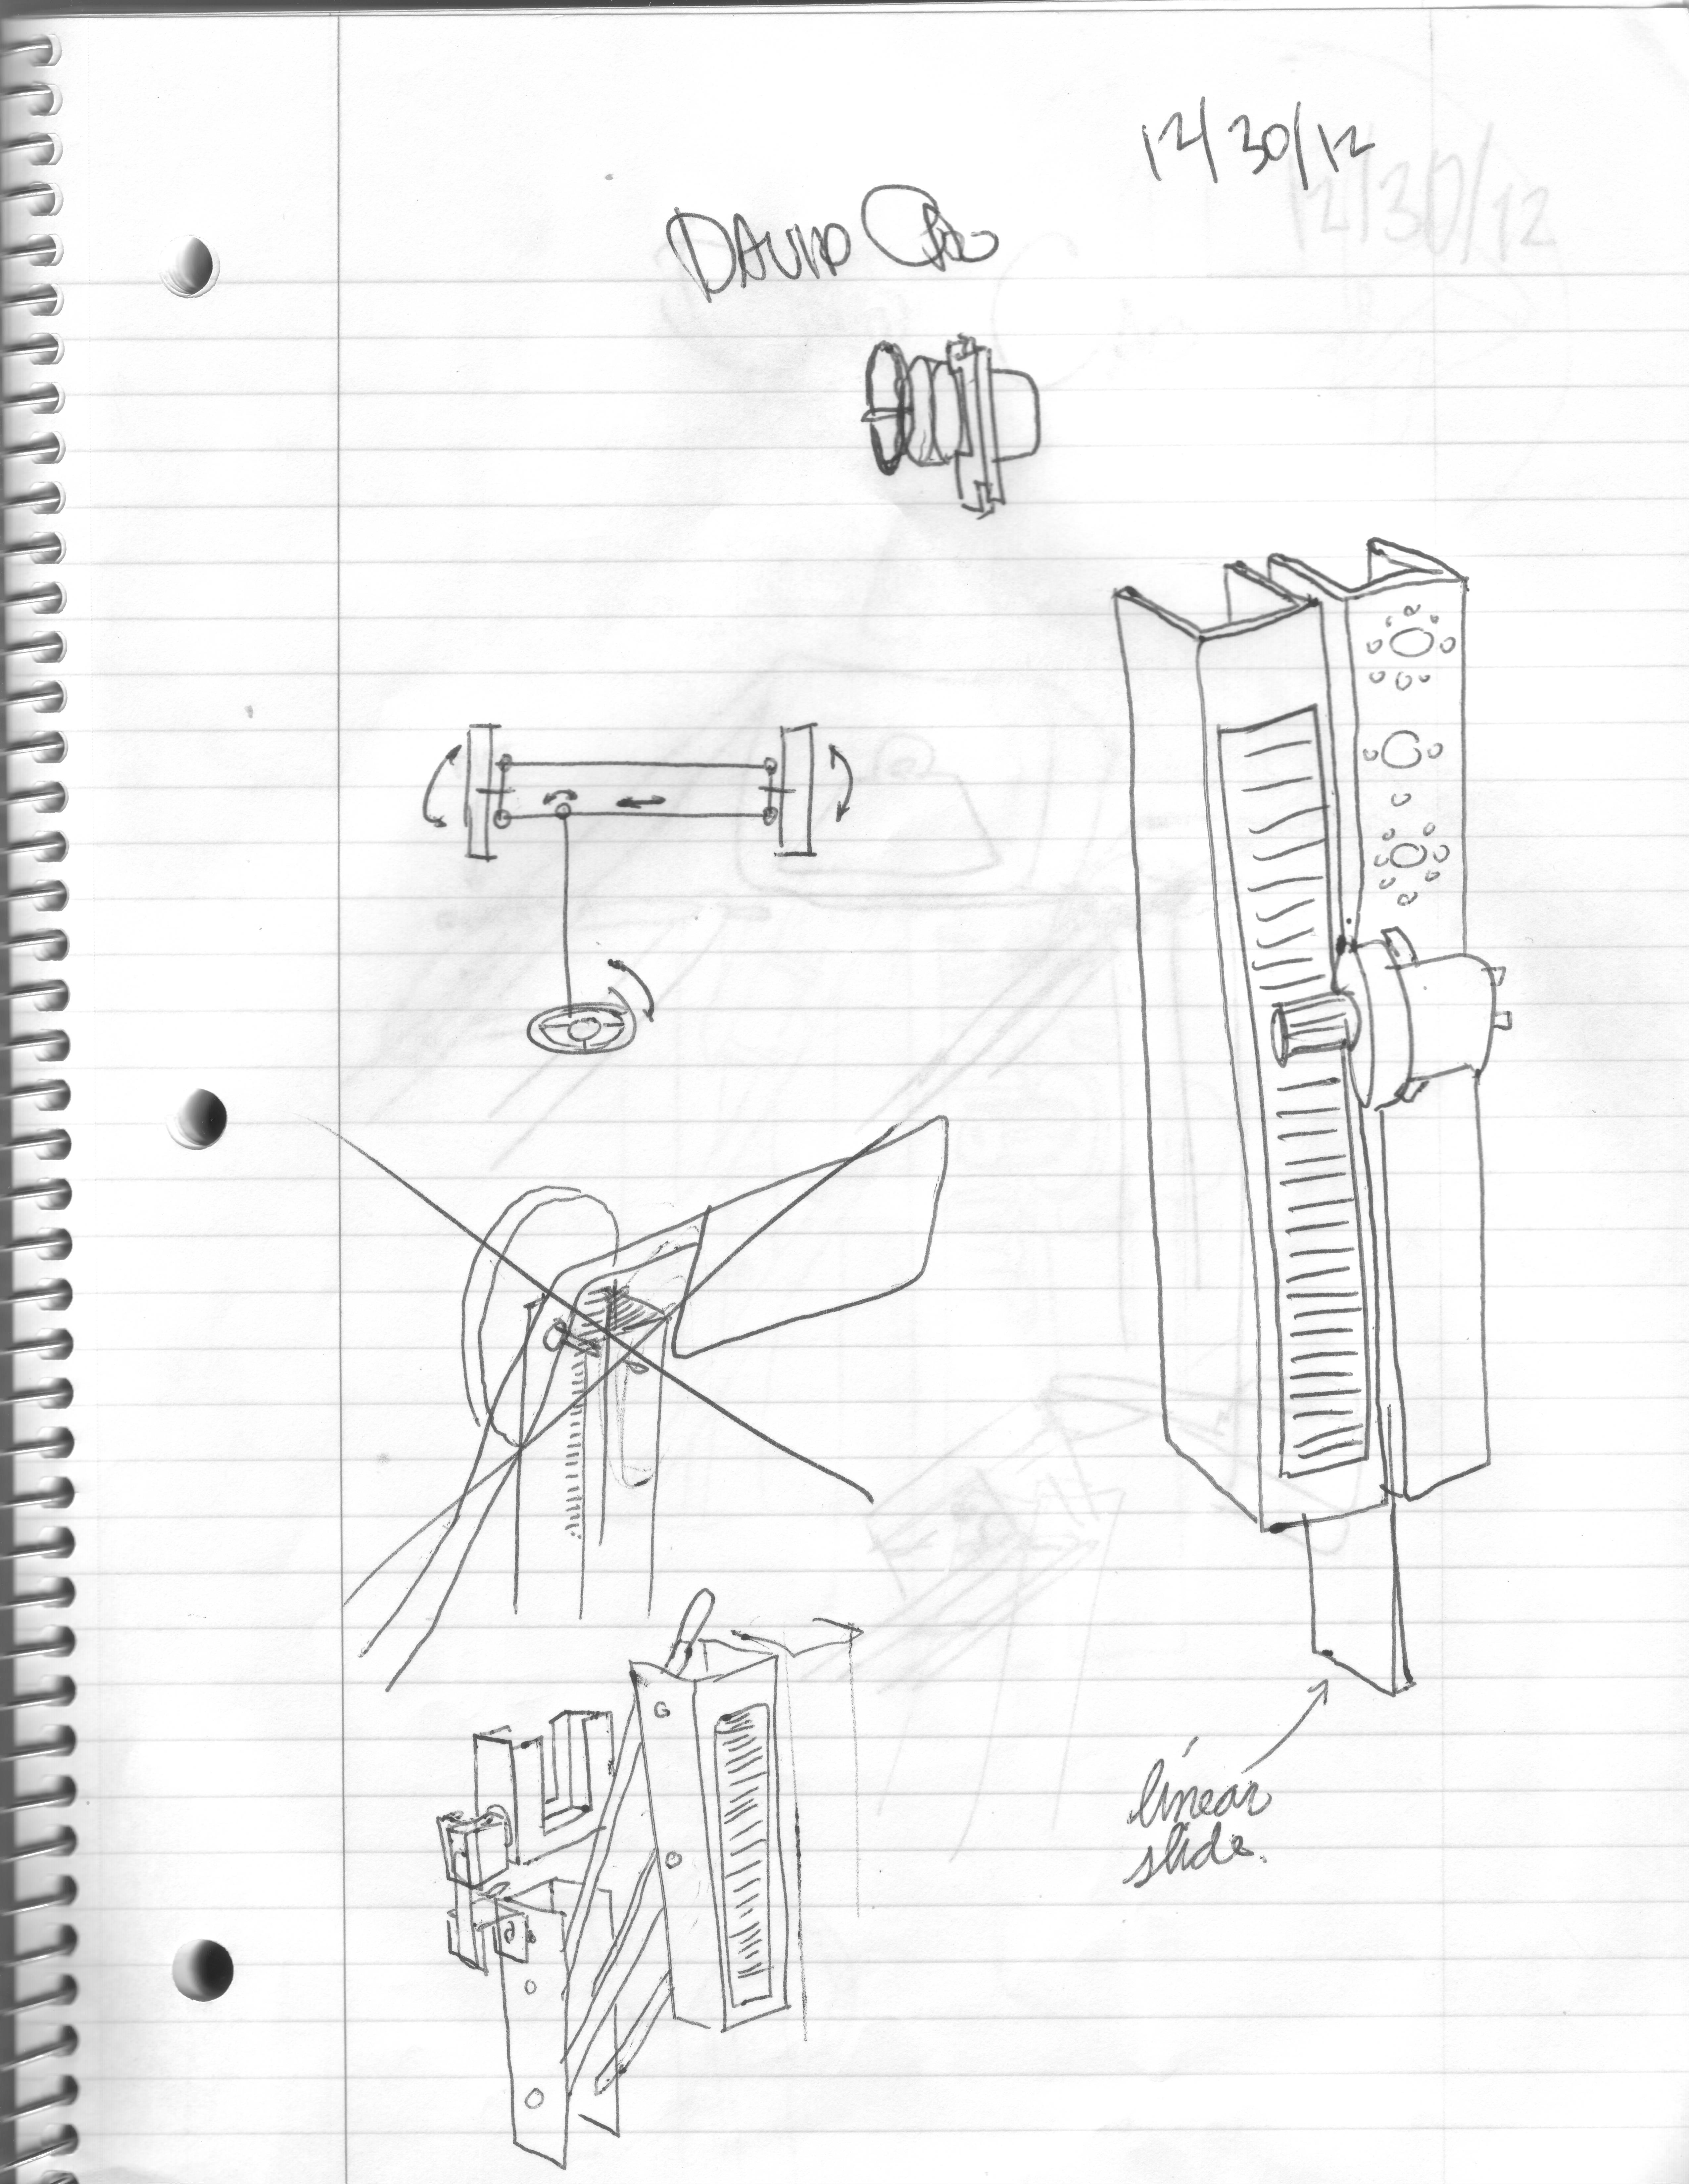 12 30 Linear Slide Mechanism New Idea David Cao